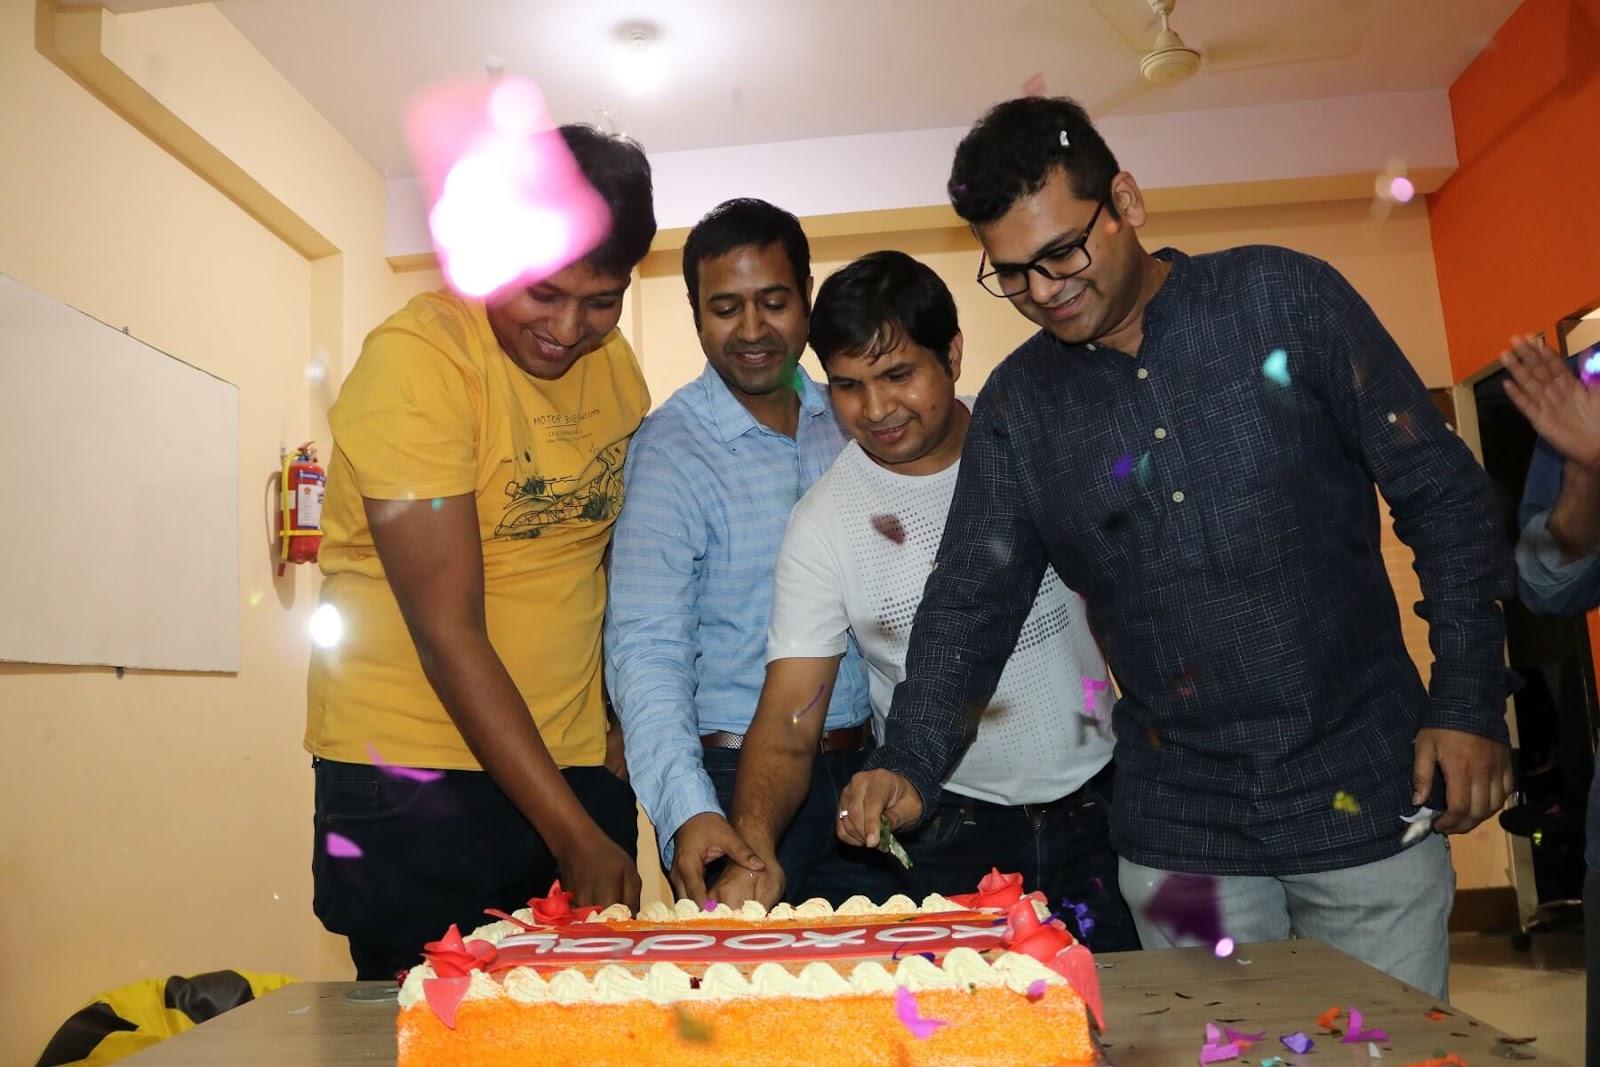 Champions of Xoxoday celebrating success